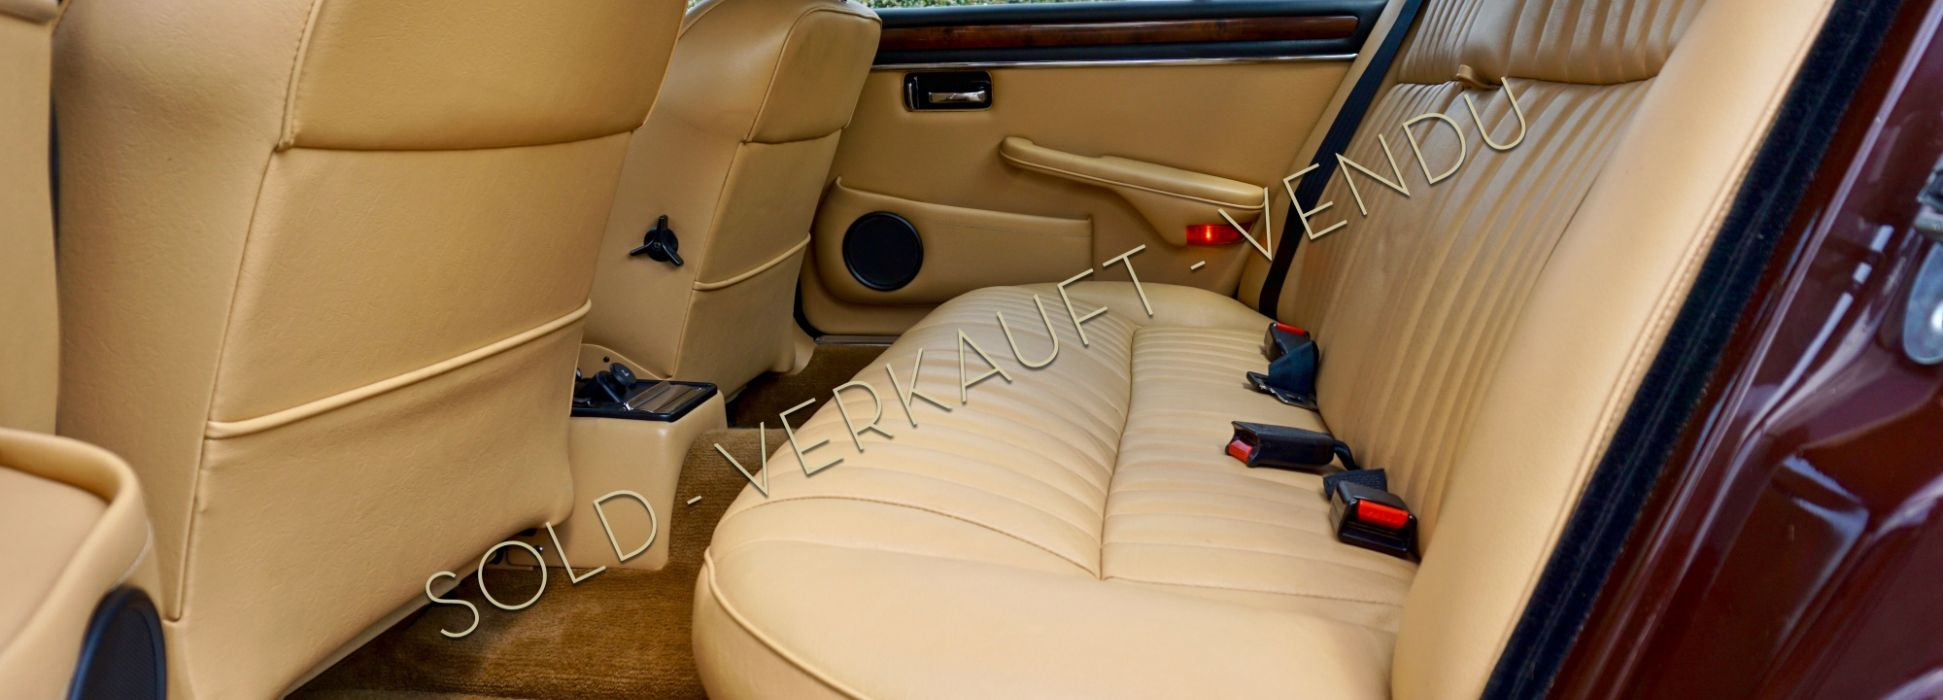 Jaguar XJ Sovereign H.E. 5